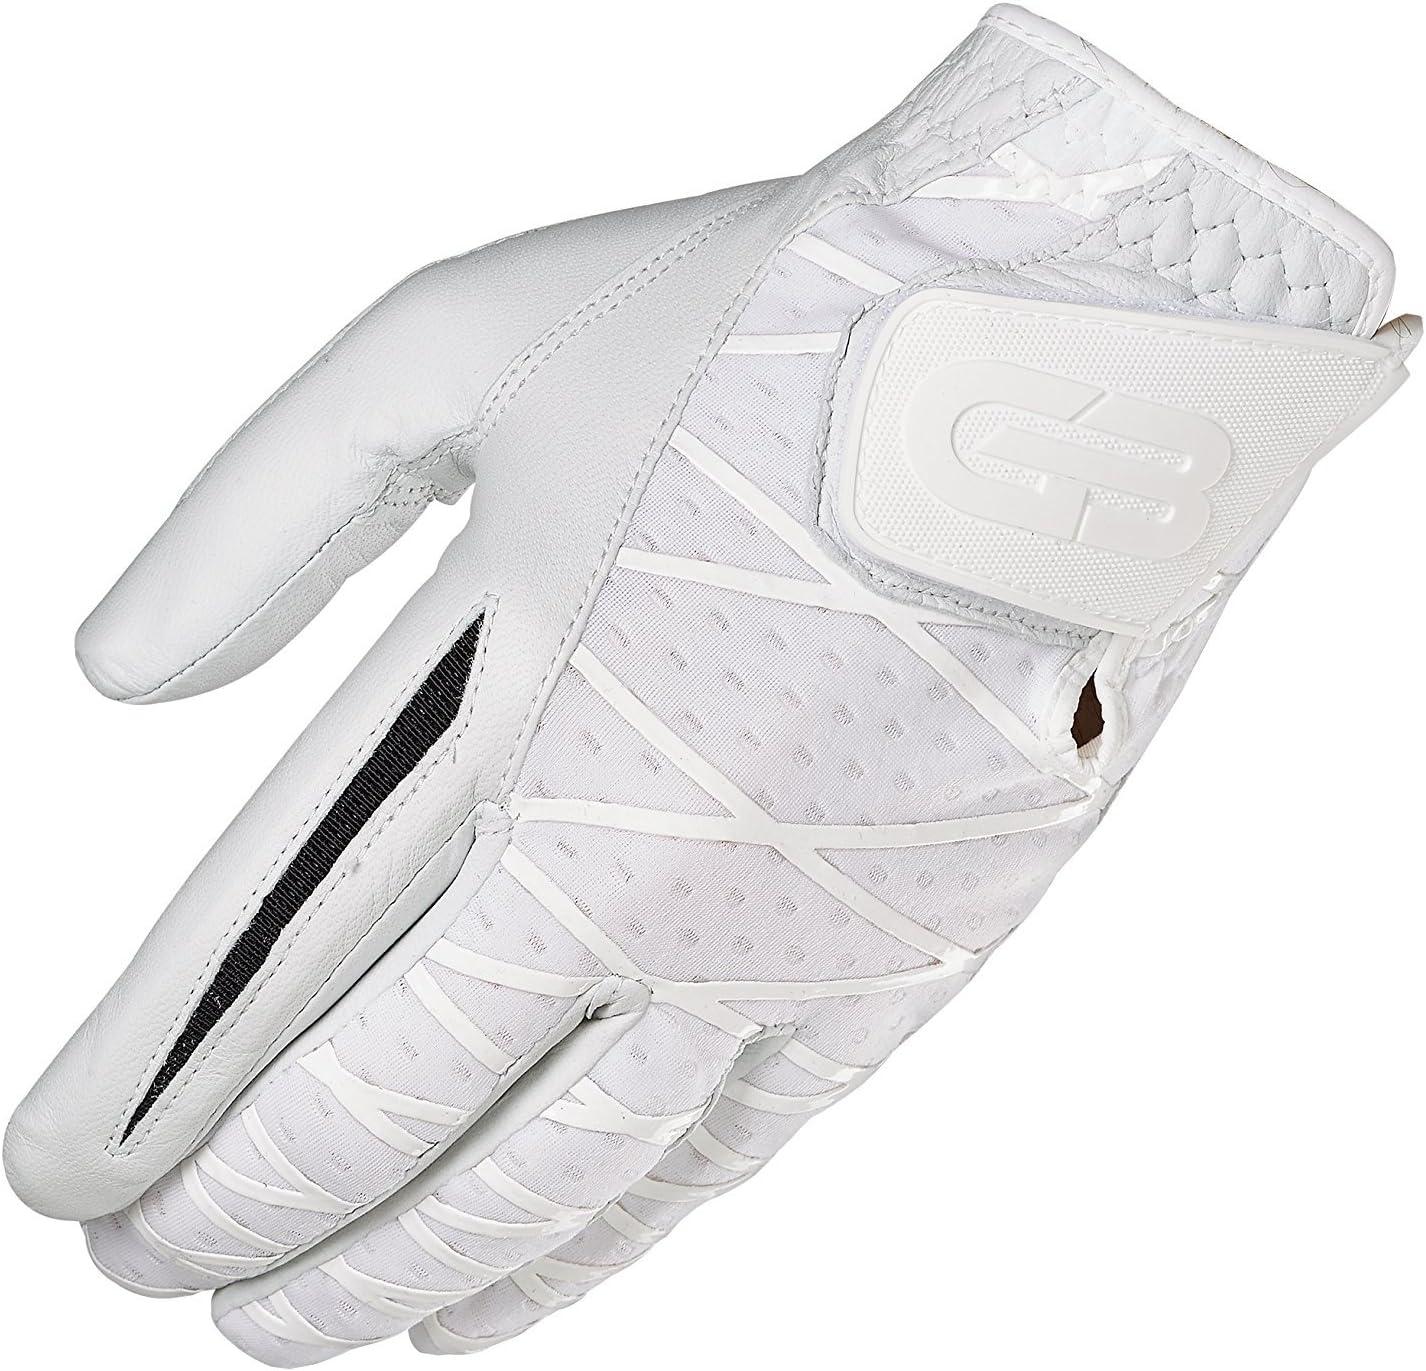 GRIP BOOST Second Skin Mens Golf Glove 2.0 (Worn on The Left Hand ...